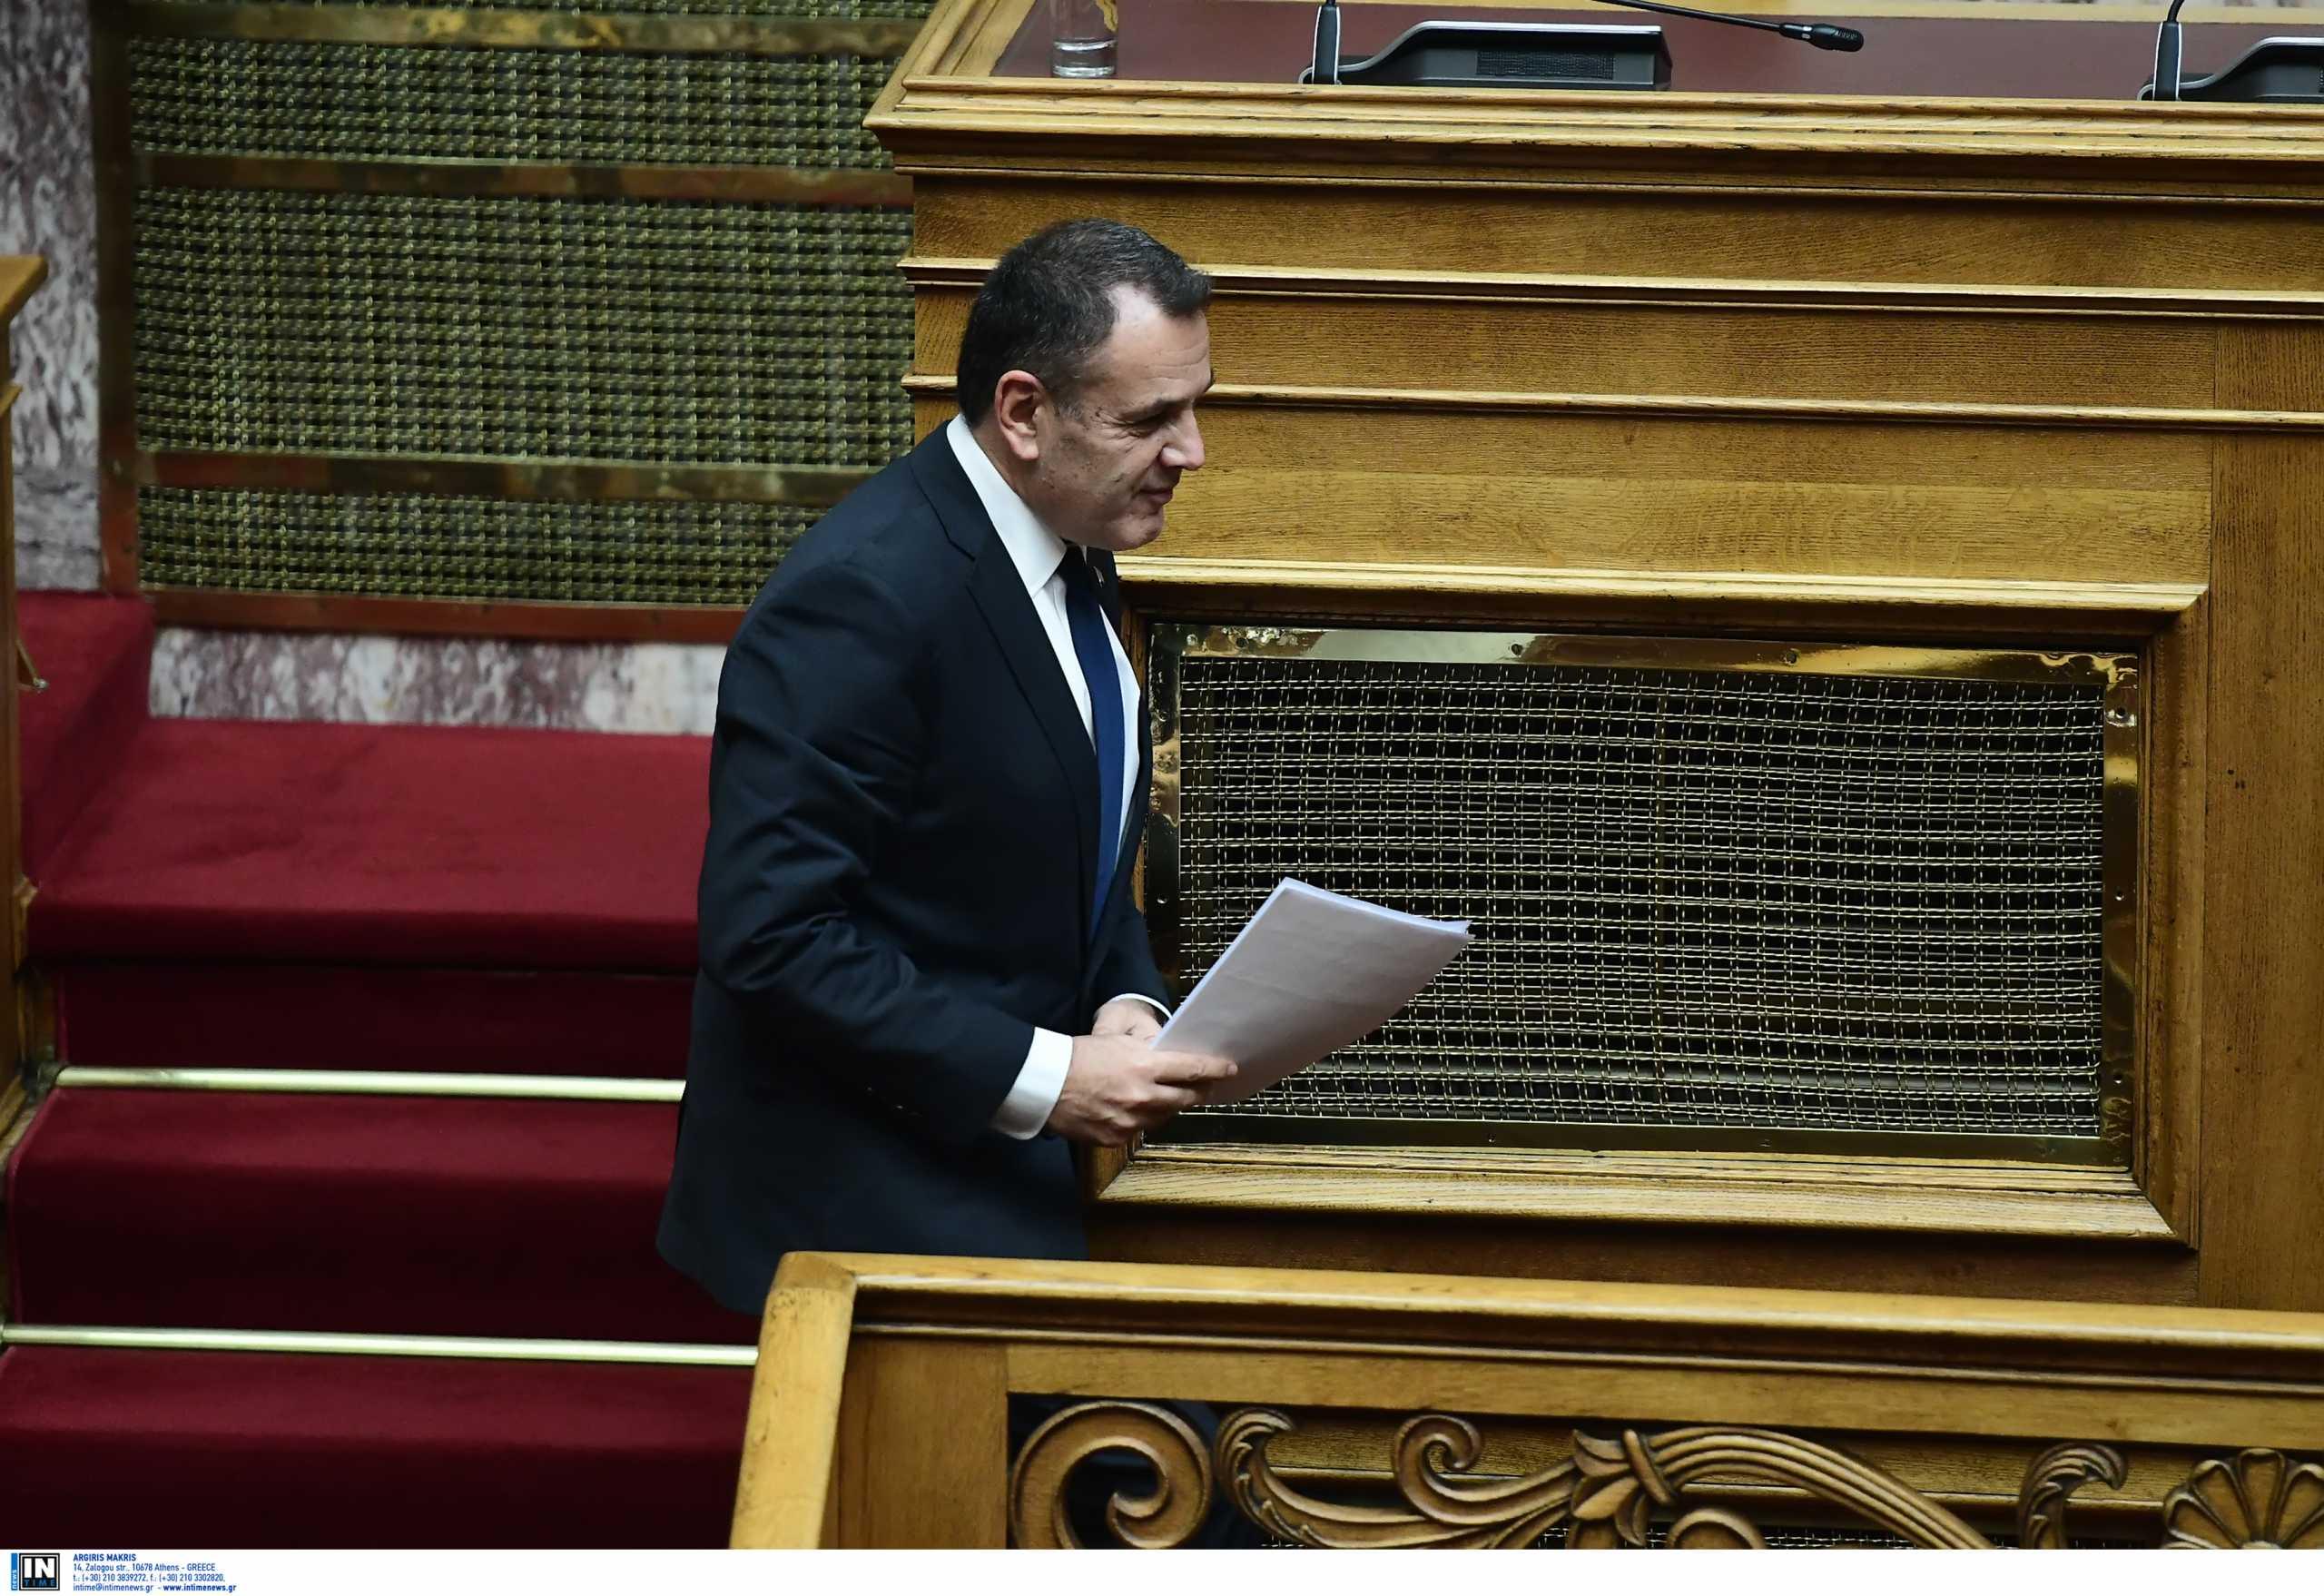 Rafale: Με ευρεία συναίνεση η ψήφιση του νομοσχεδίου επί της αρχής – Ποια κόμματα καταψήφισαν